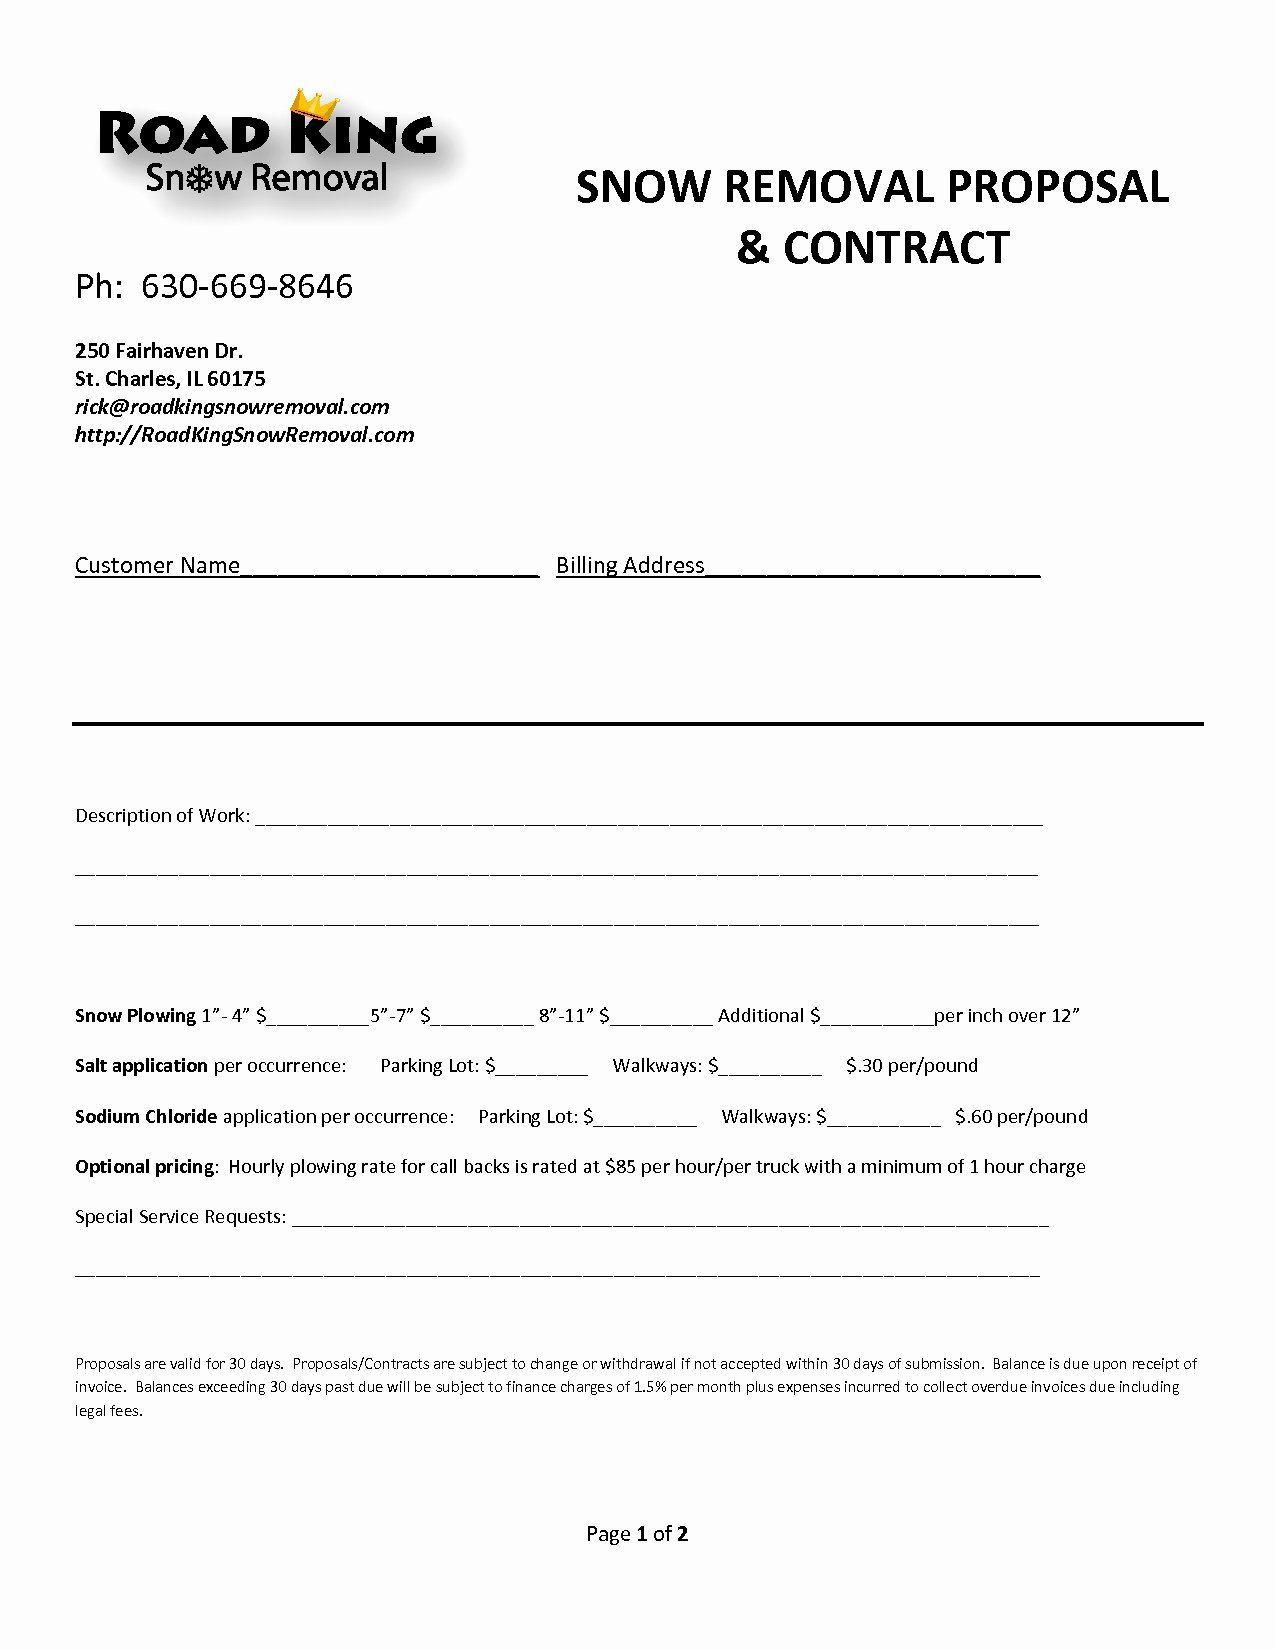 000 Singular Snow Removal Contract Template Sample  Templates Free Printable Simple Seasonal Plow AgreementFull